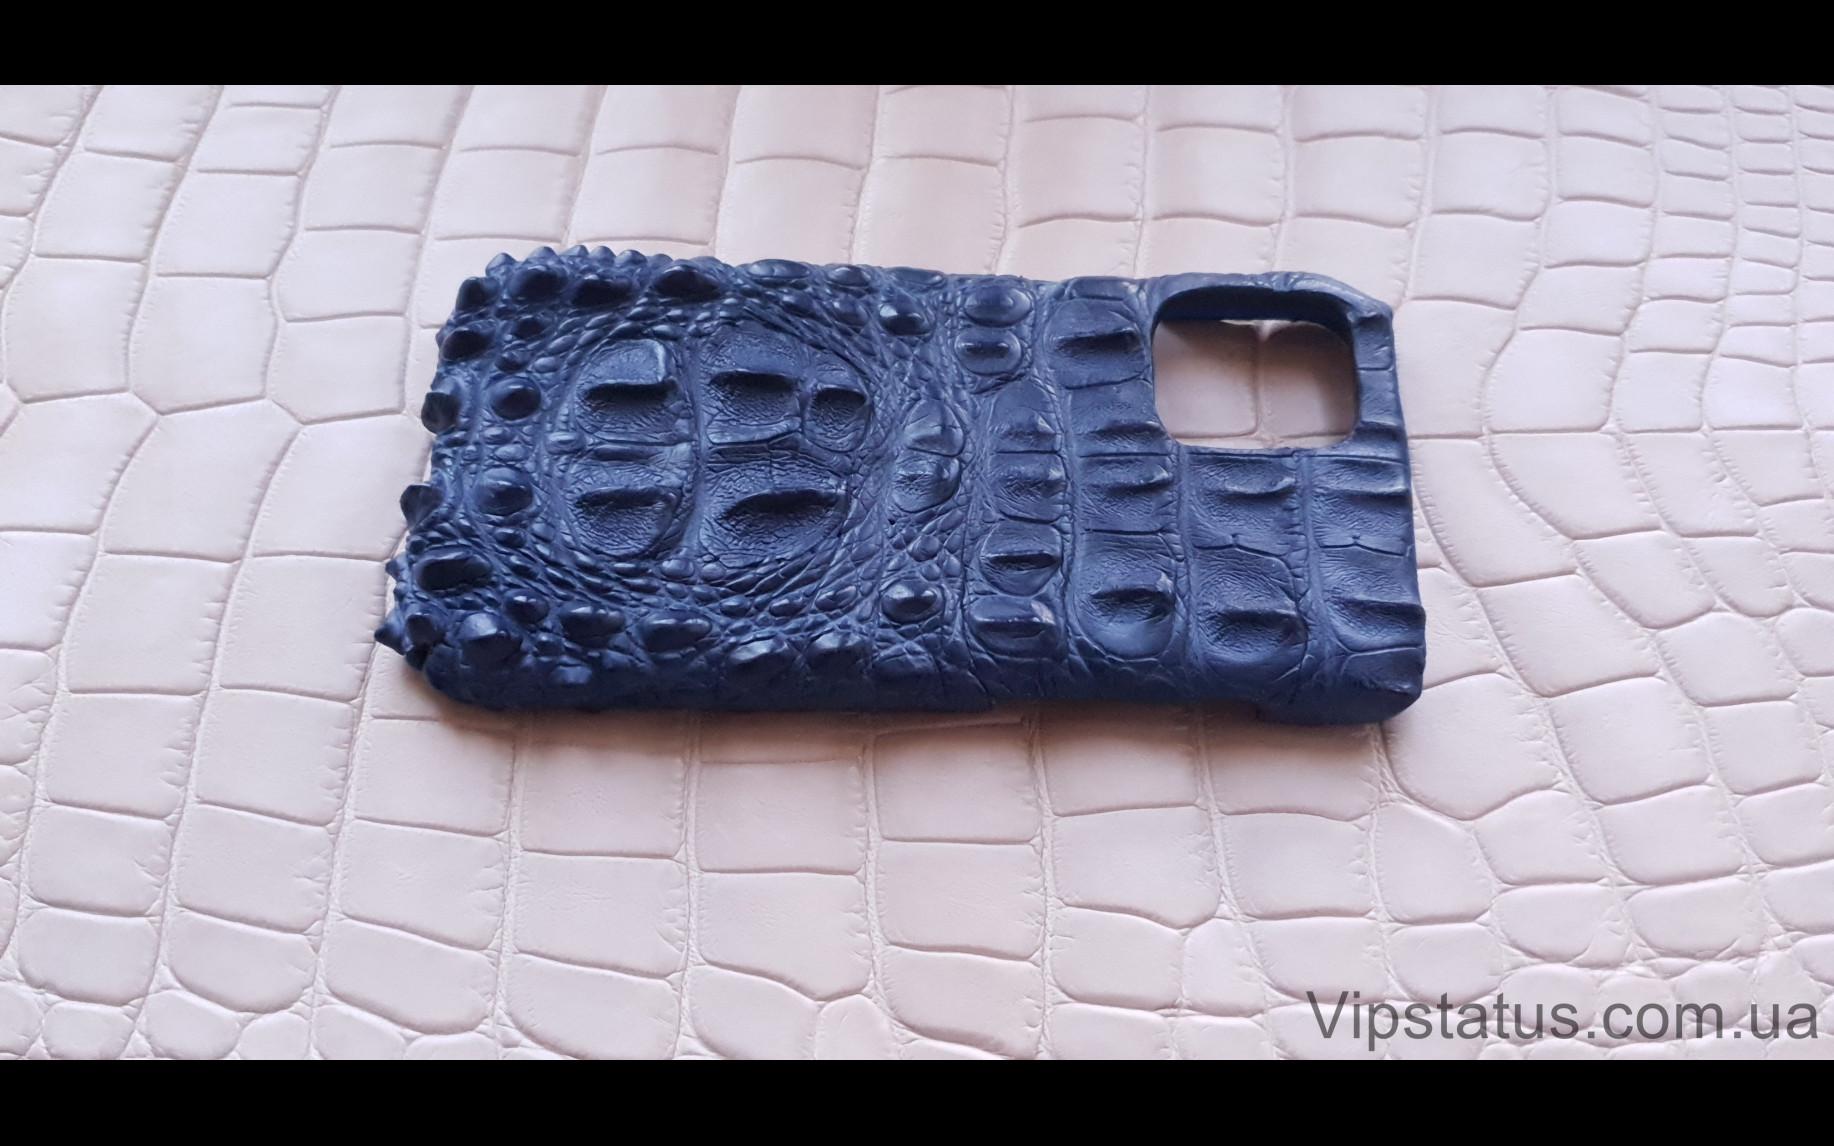 Elite Blue King Премиум чехол IPhone 11 12 Pro Max кожа крокодила Blue King Premium case IPhone 11 12 Pro Max Crocodile leather image 4